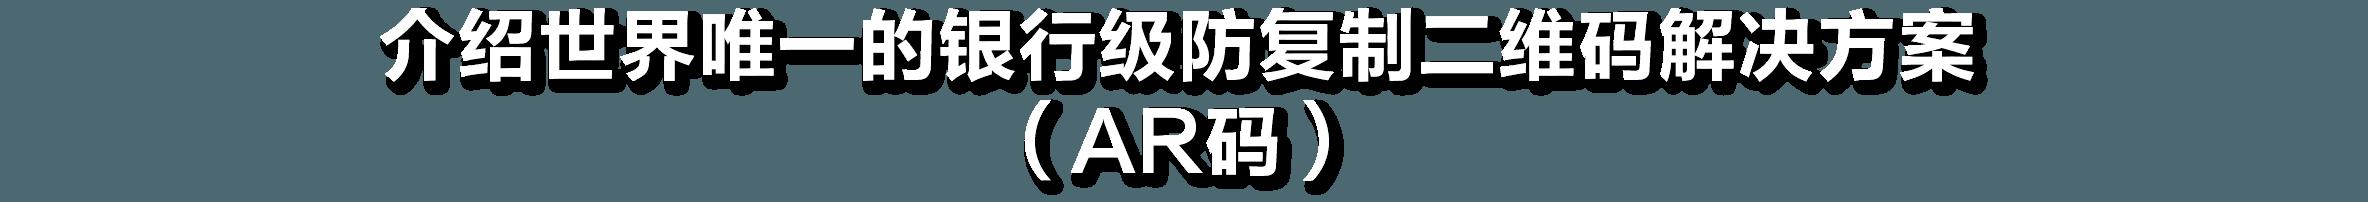 ar-banner-text1-cn-min